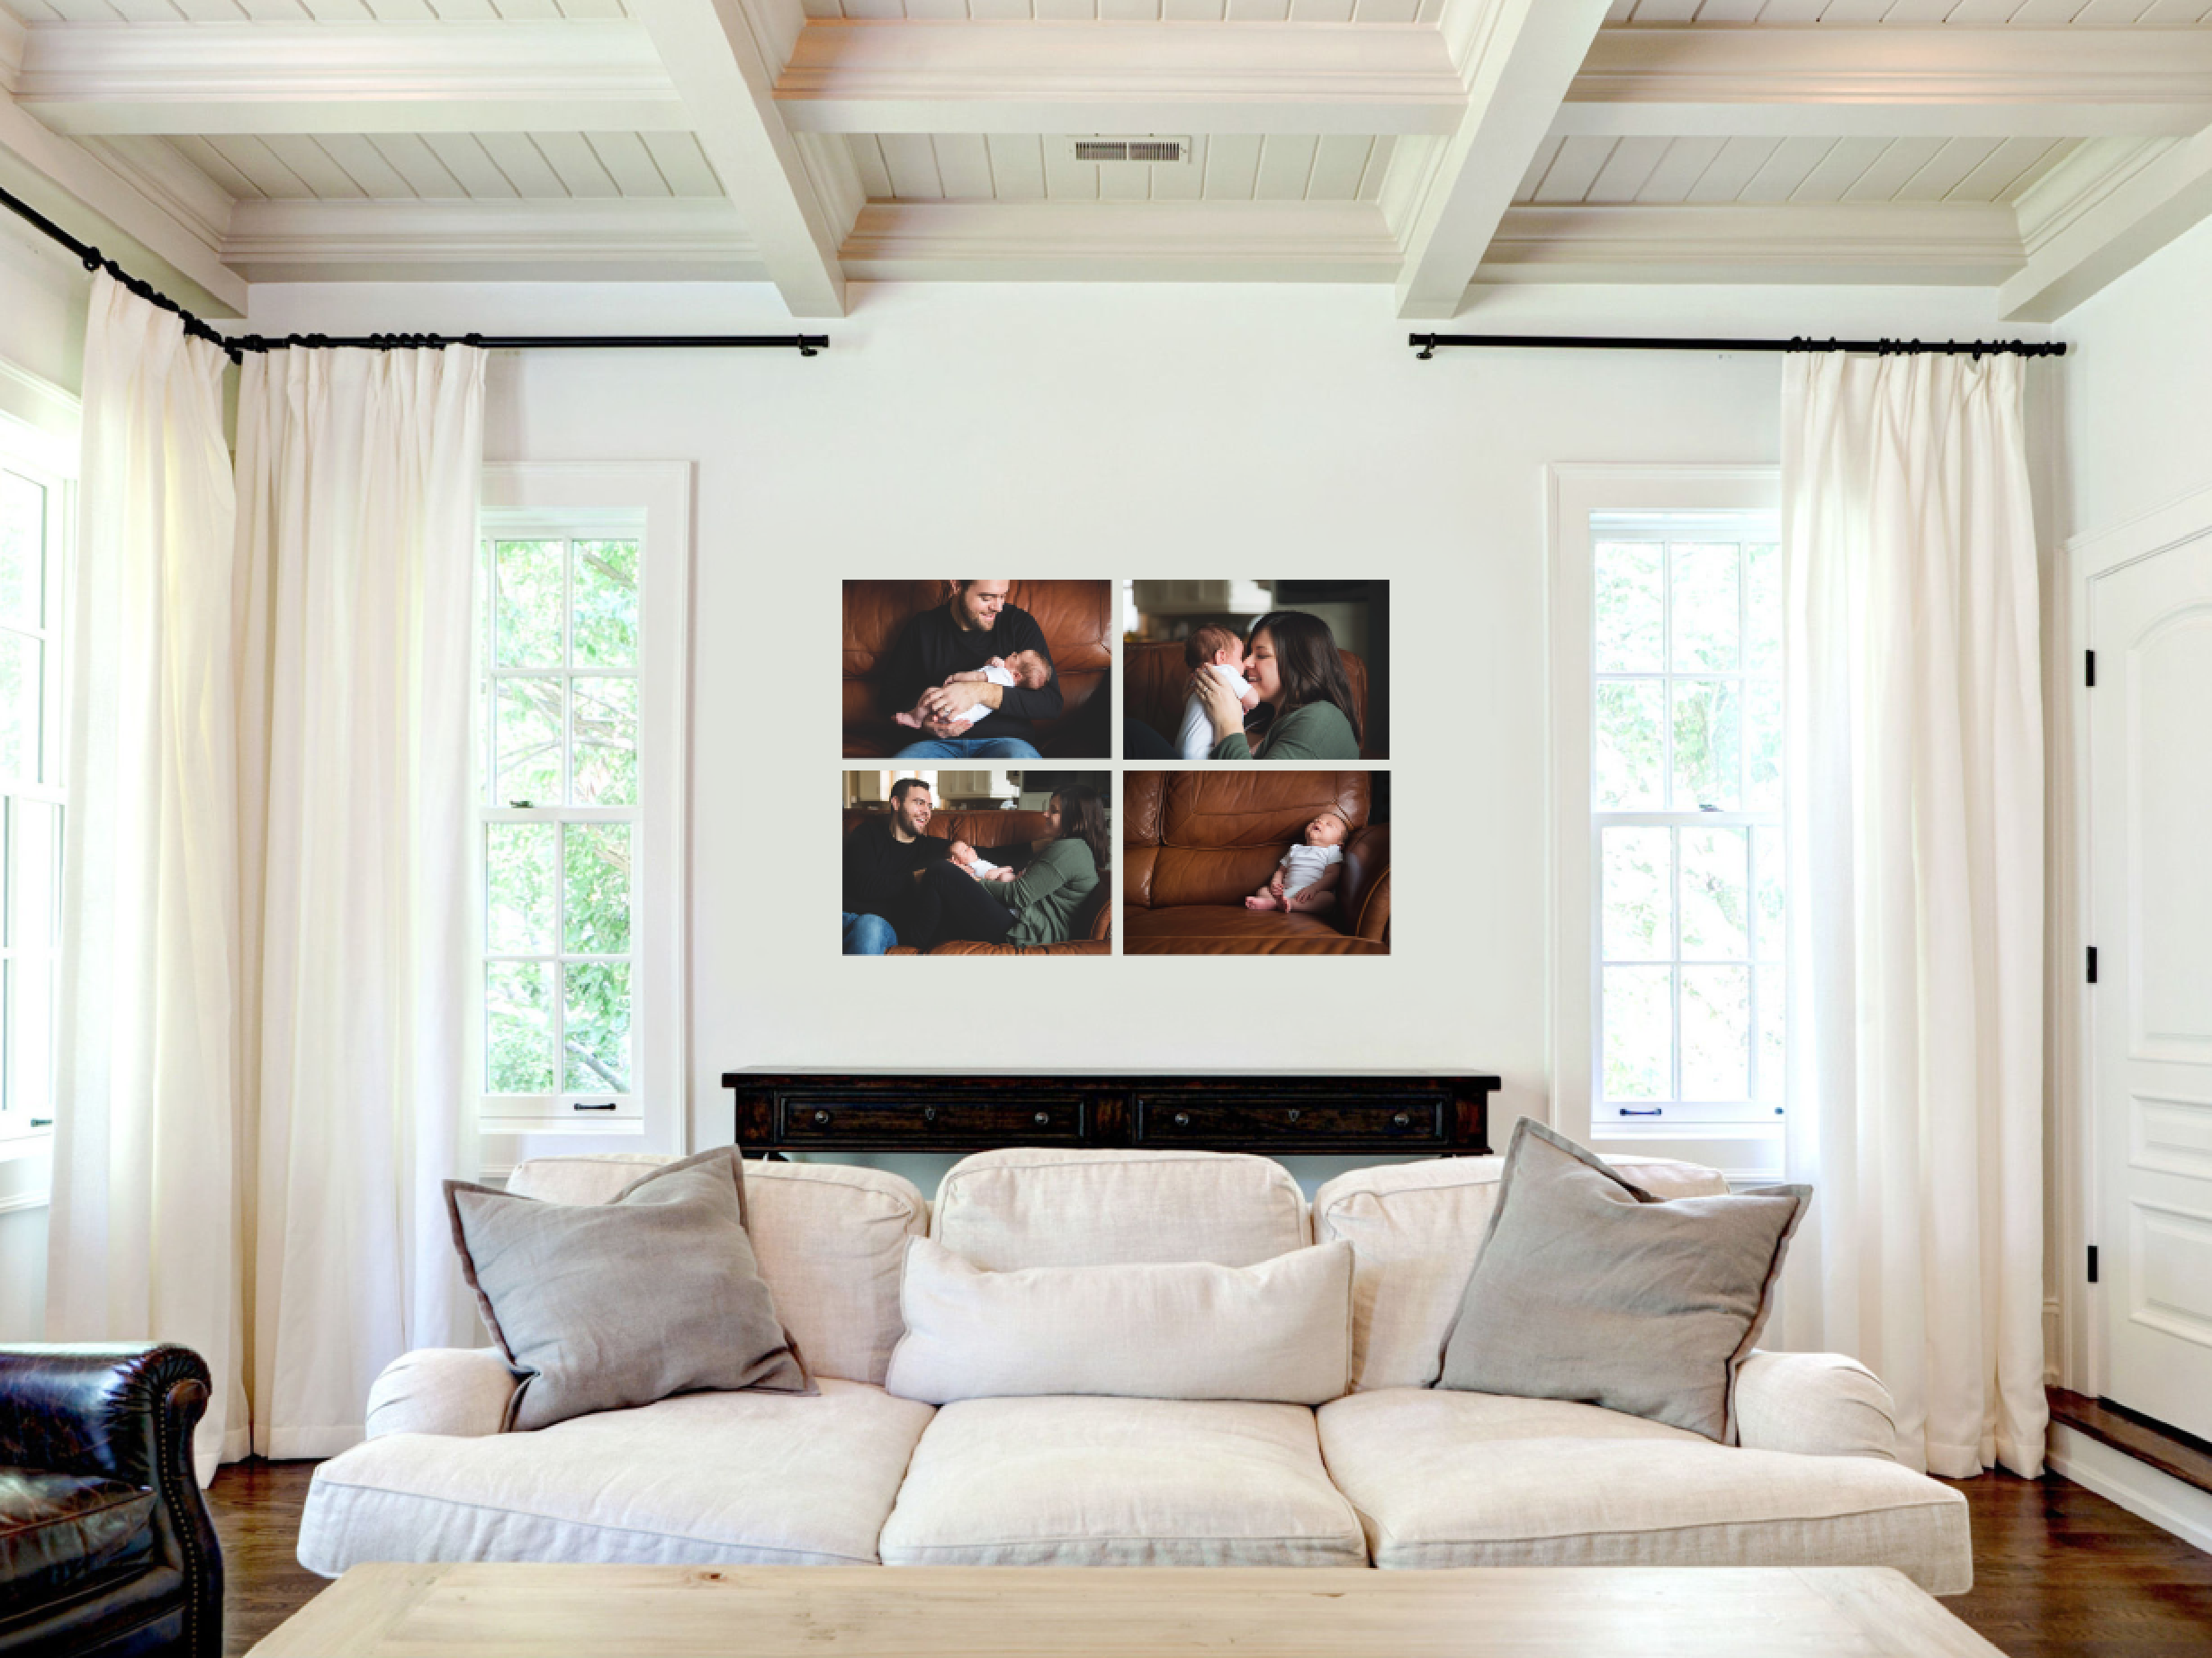 Wall-Collection-Art-Portraits-Products-Albums-Photography-Heirlooms-Session-Lifestyle-Wedding-Photographer-Hamilton-Burlington-Oakville-Toronto-Niagara-Moments-by-Lauren-Sample-Image-Photo18